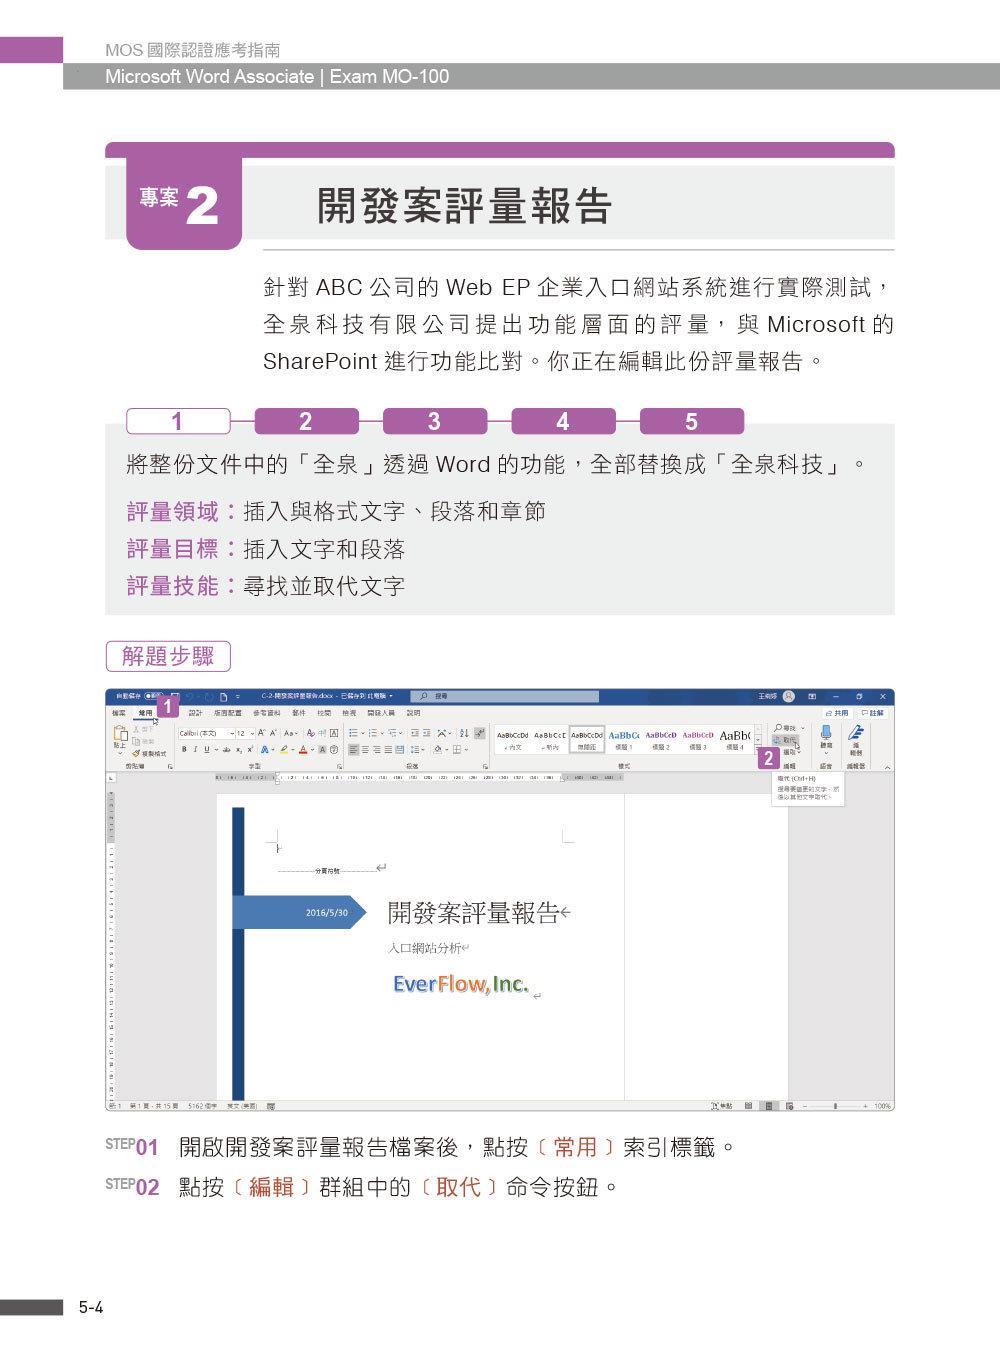 MOS 國際認證應考指南 -- Microsoft Word Associate|Exam MO-100-preview-6